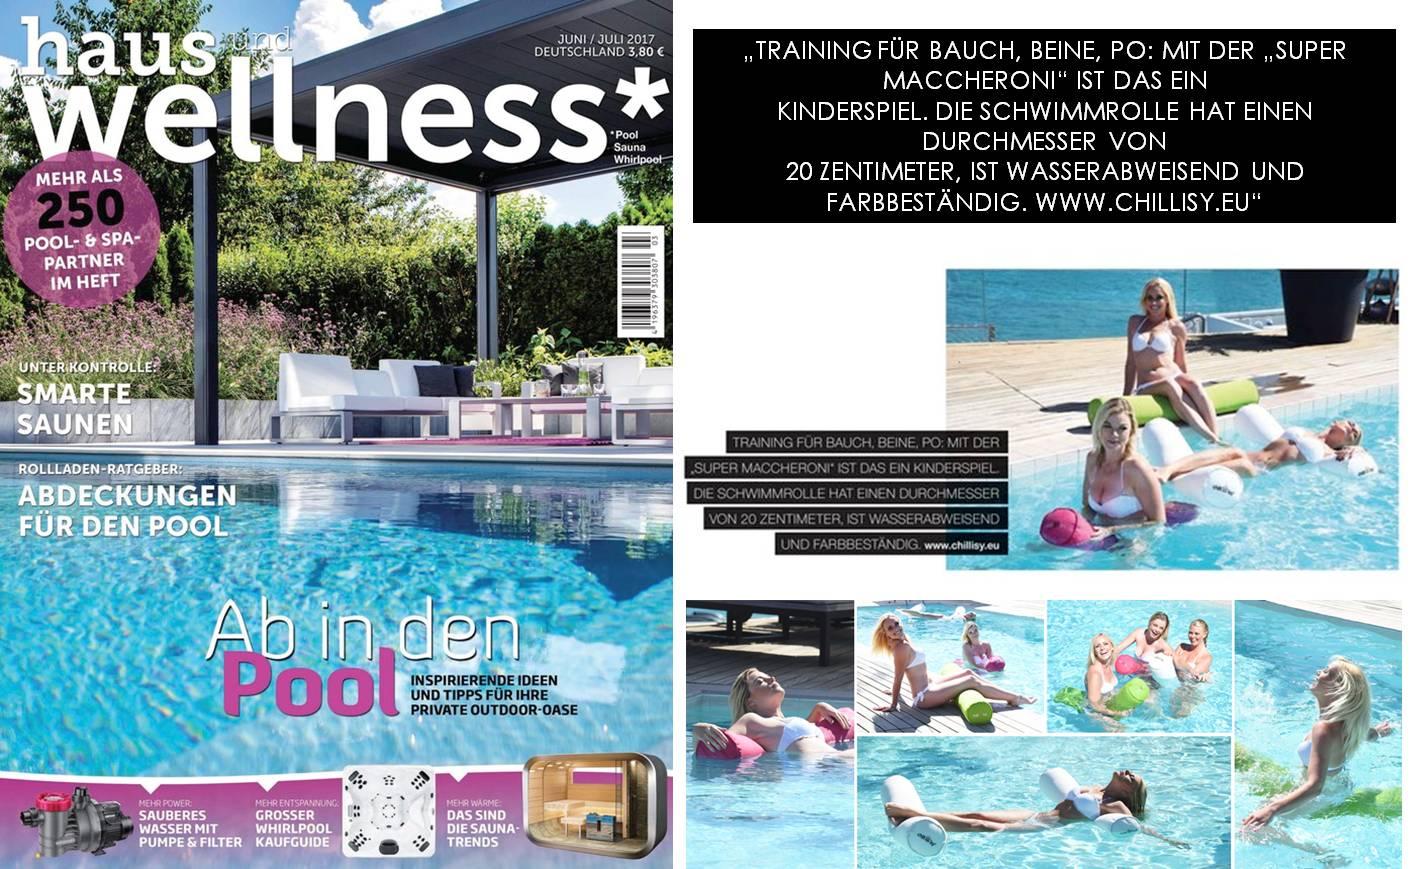 Poolnudel Super Maccheroni von chillisy im Magazin Haus und Wellness